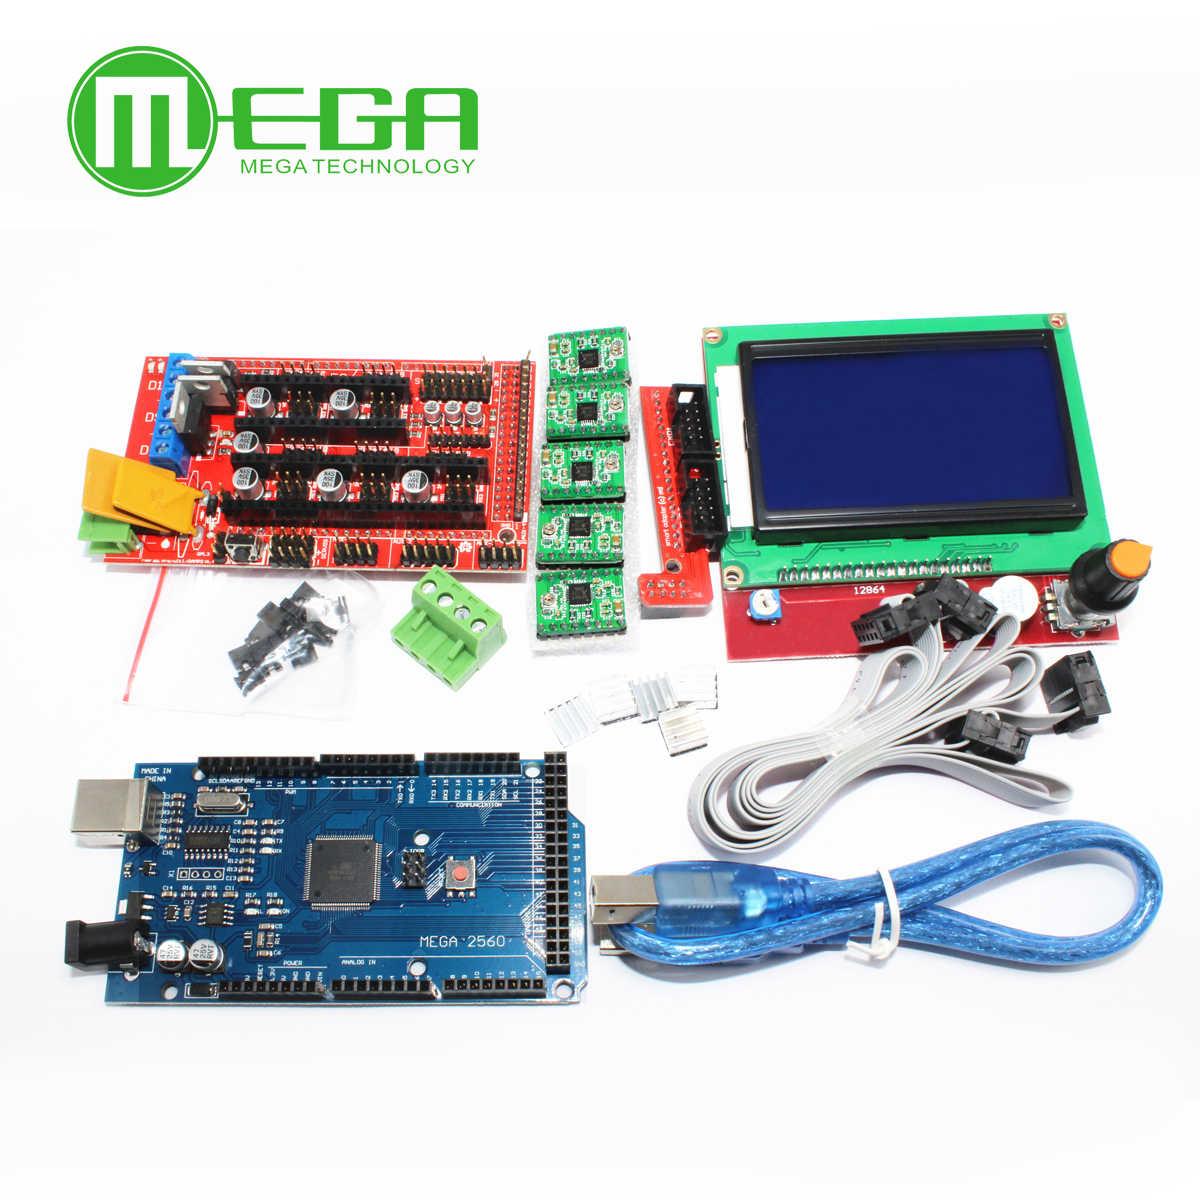 1Pcs Mega 2560 R3 CH340 + 1Pcs RAMPS 1.4 Controller + 5Pcs A4988 Stepper Driver Module + 1Pcs 12864 สำหรับ 3Dชุดเครื่องพิมพ์